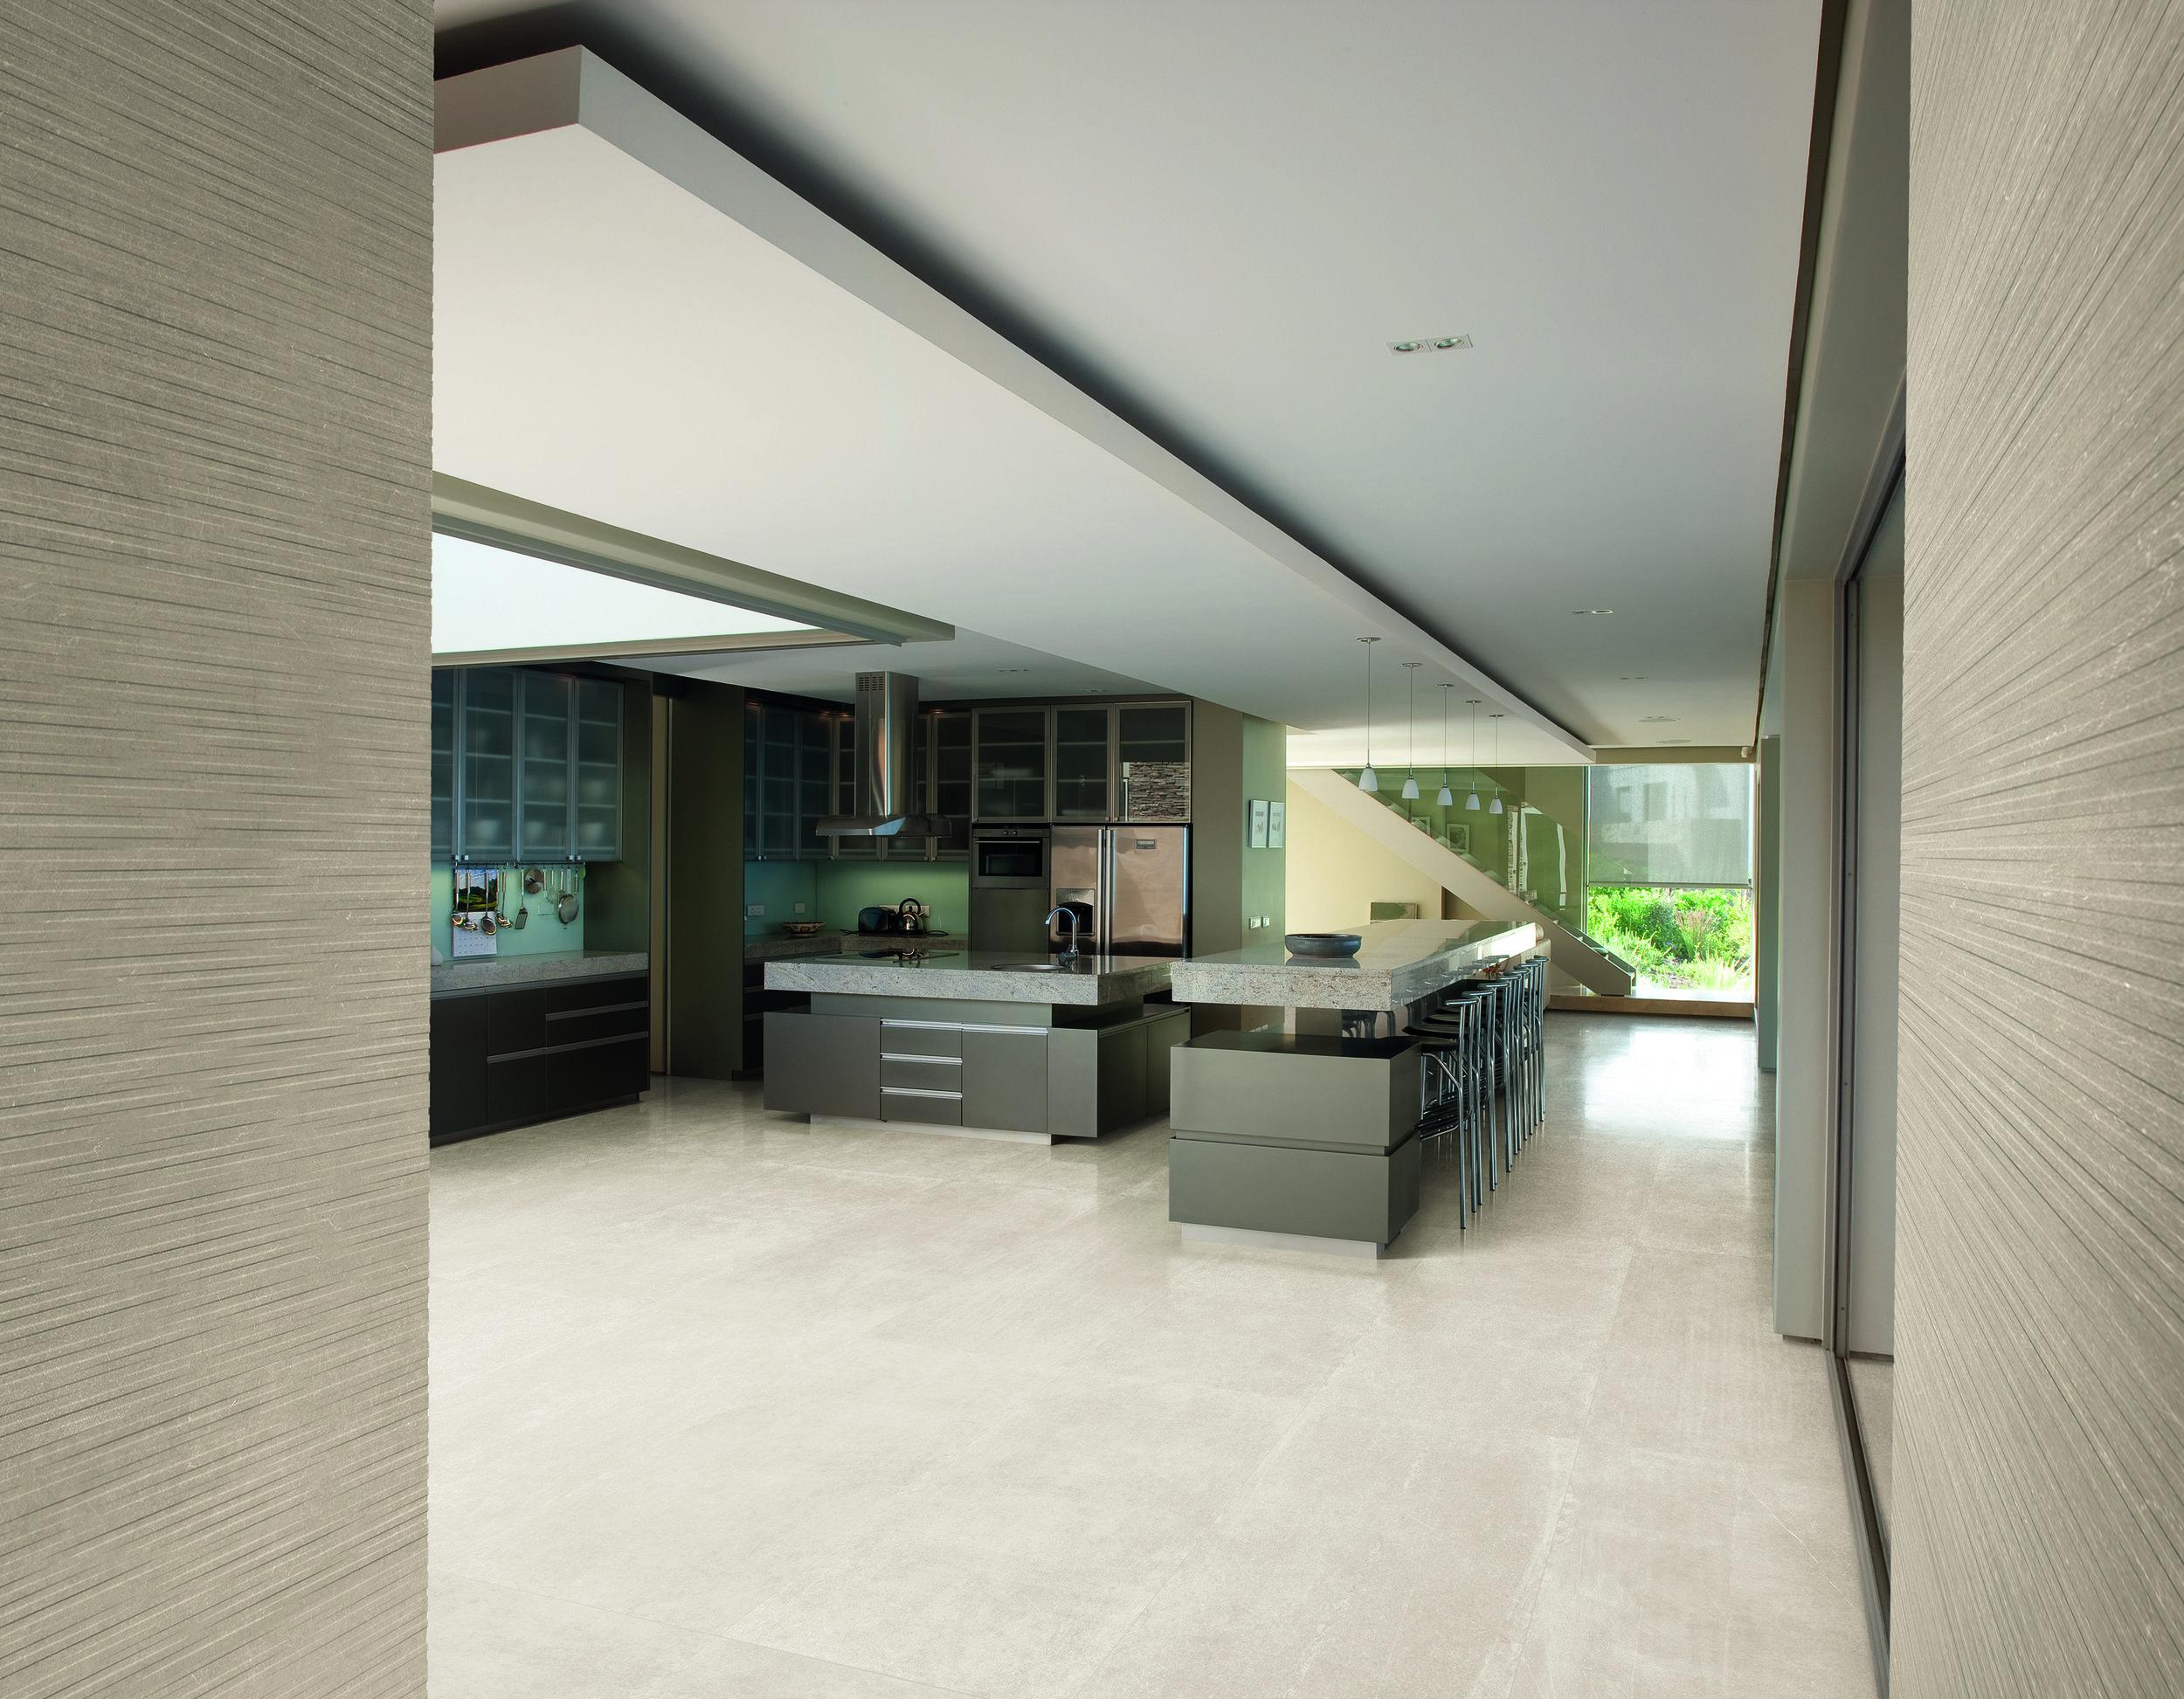 Limestone White Lappato 60x120-Parallelo Beige Amb. Cucina.jpg